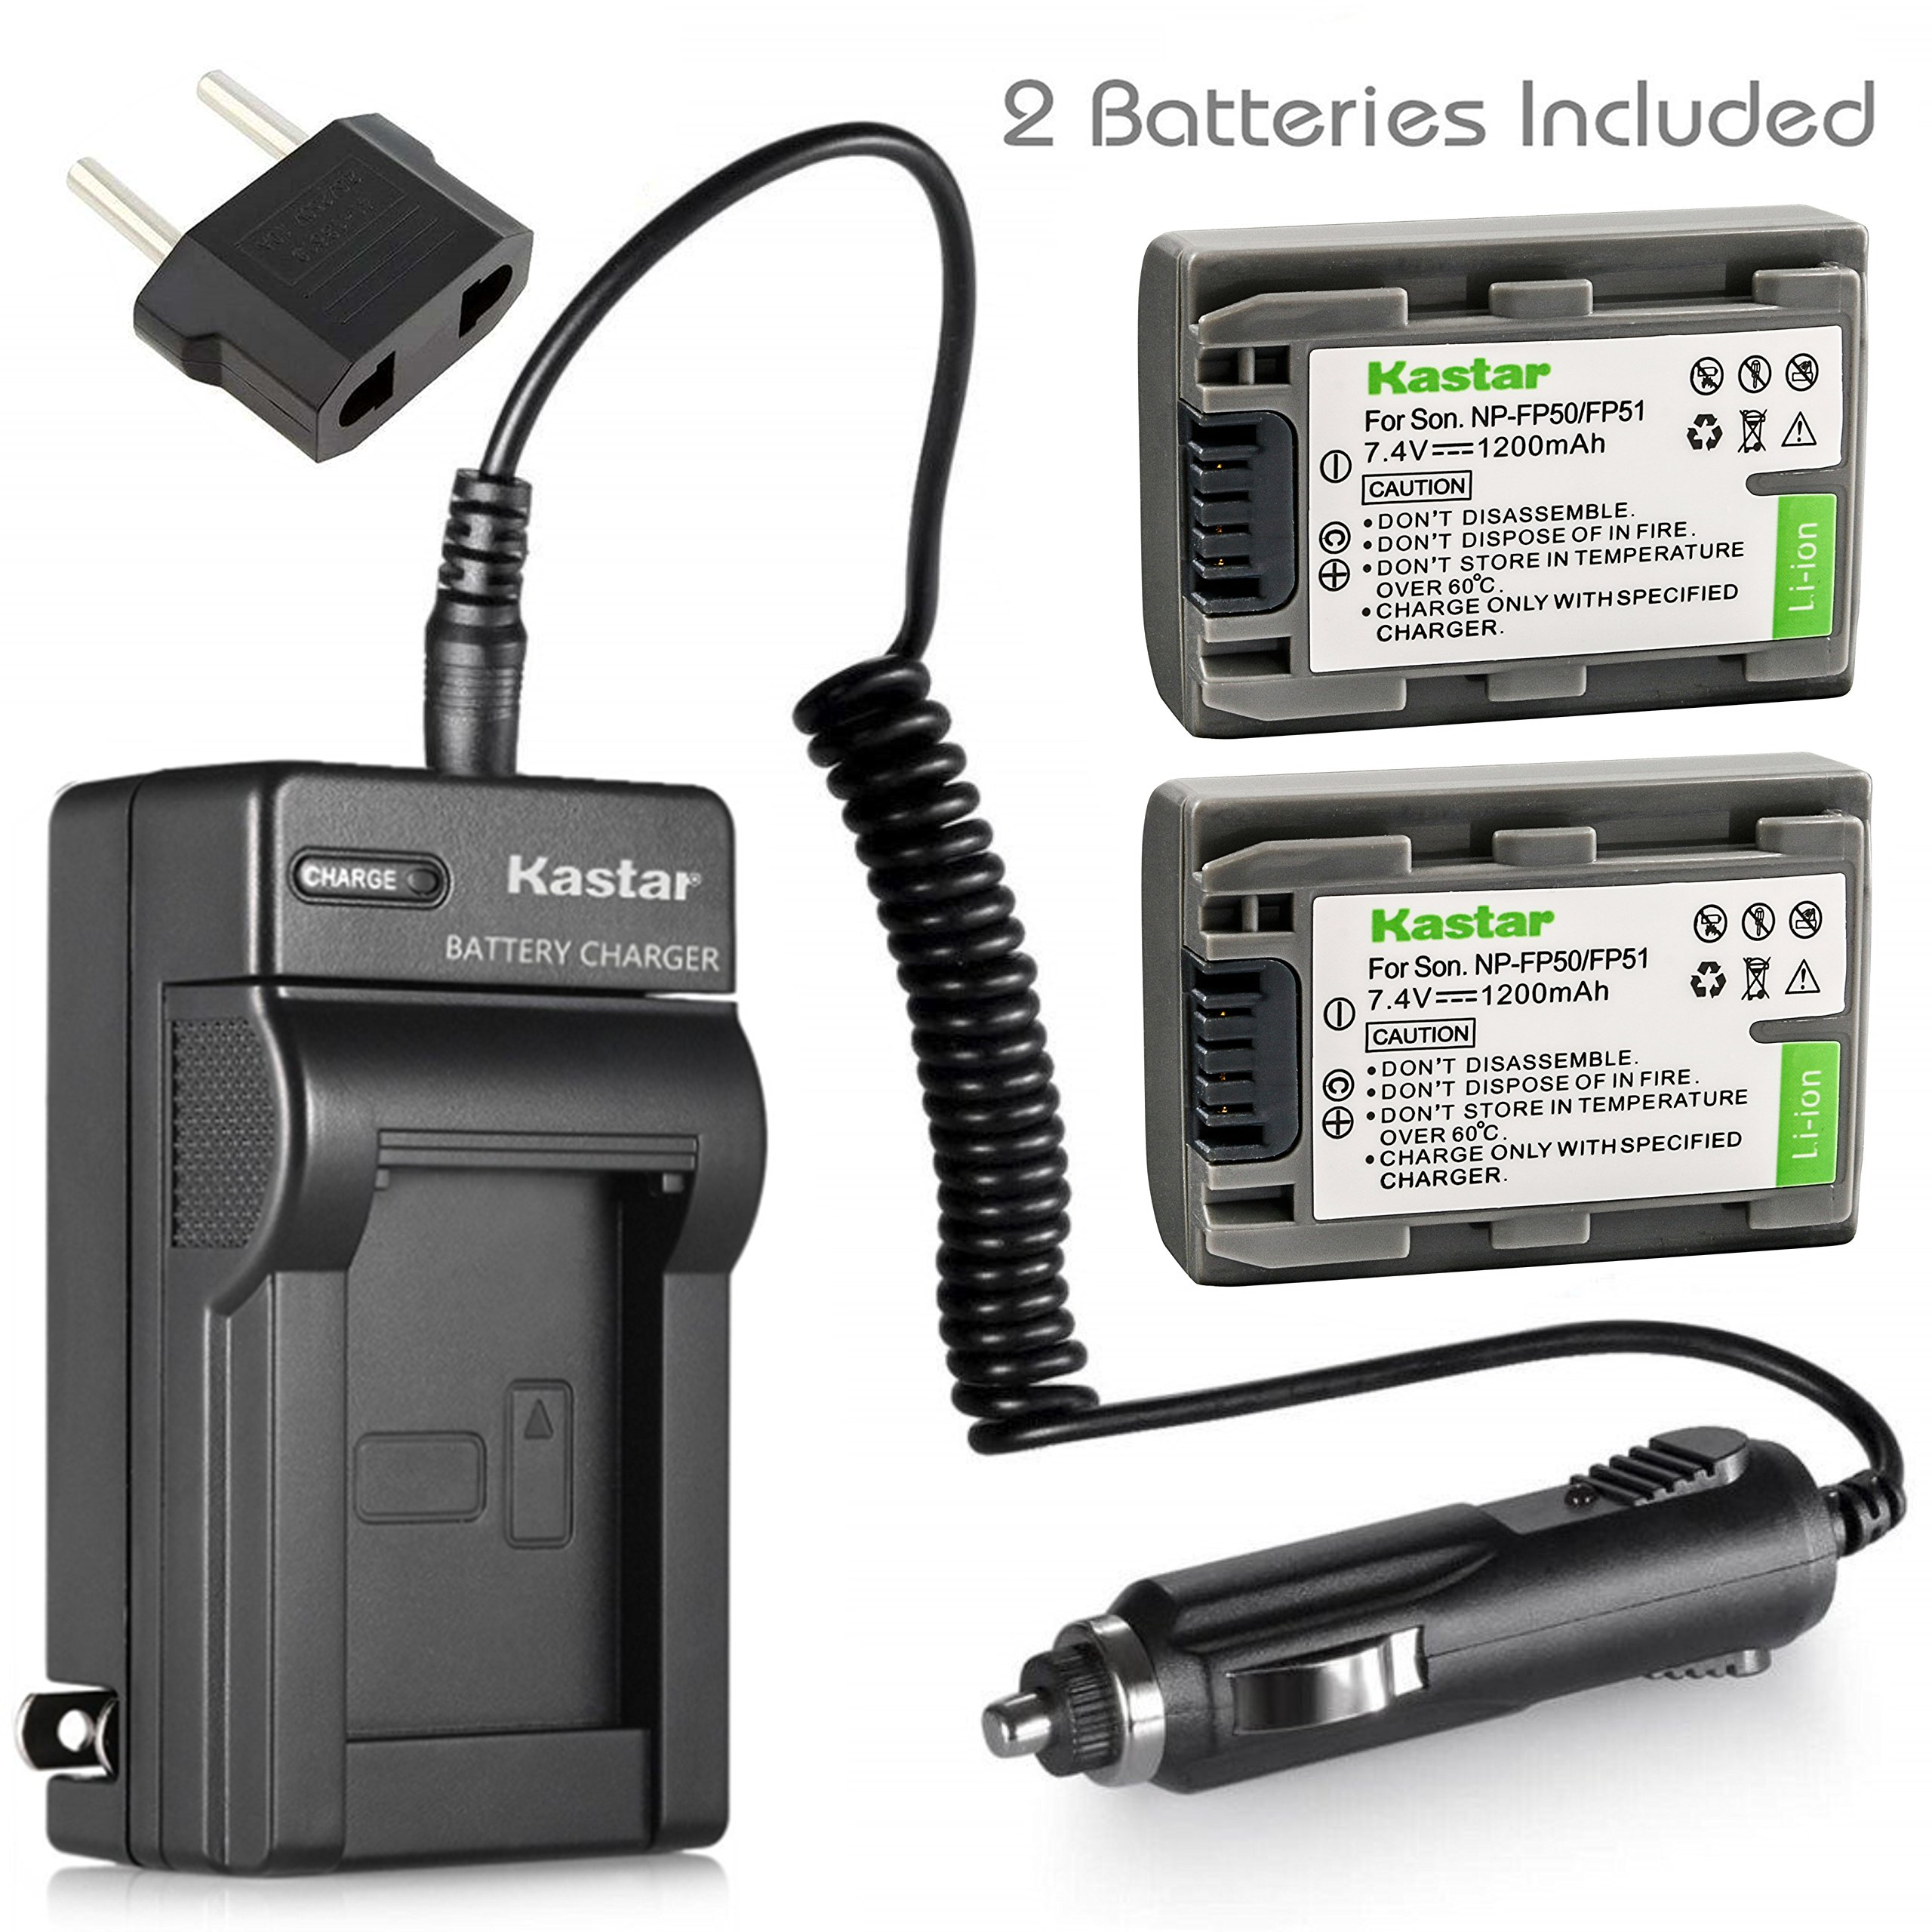 Kastar Battery (2-Pack) + Charger Kit for Sony NP-FP51, NP-FP50, NP-FP30, NP-FP70, NP-FP60, NP-FP71, TRV, TRV-U & Sony DCR-HC30 40 43E 65 85 94E 96 DCR-SR30 40E 50E 60E 70E 80E 100 Camera